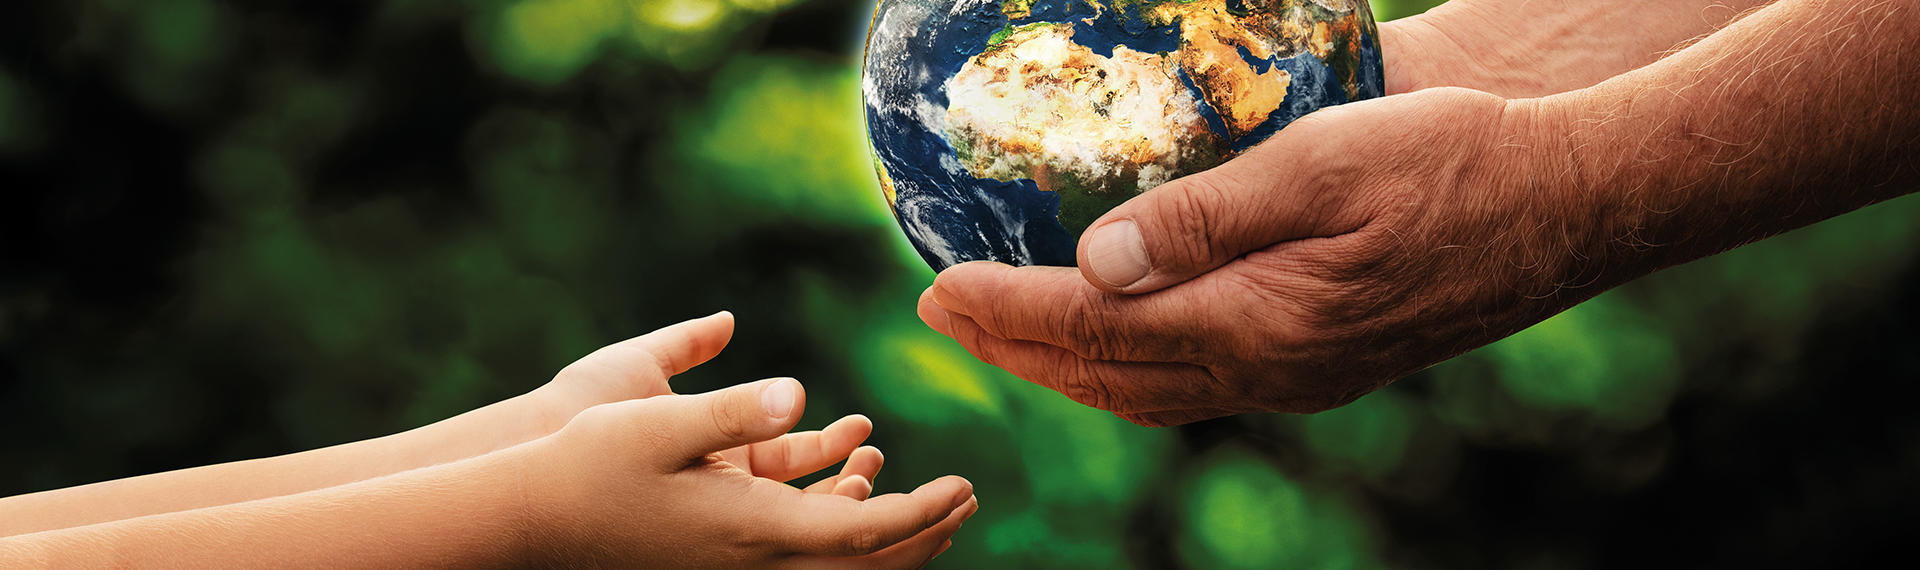 Investissement d'impact ou « Impact Investing » : une suite logique